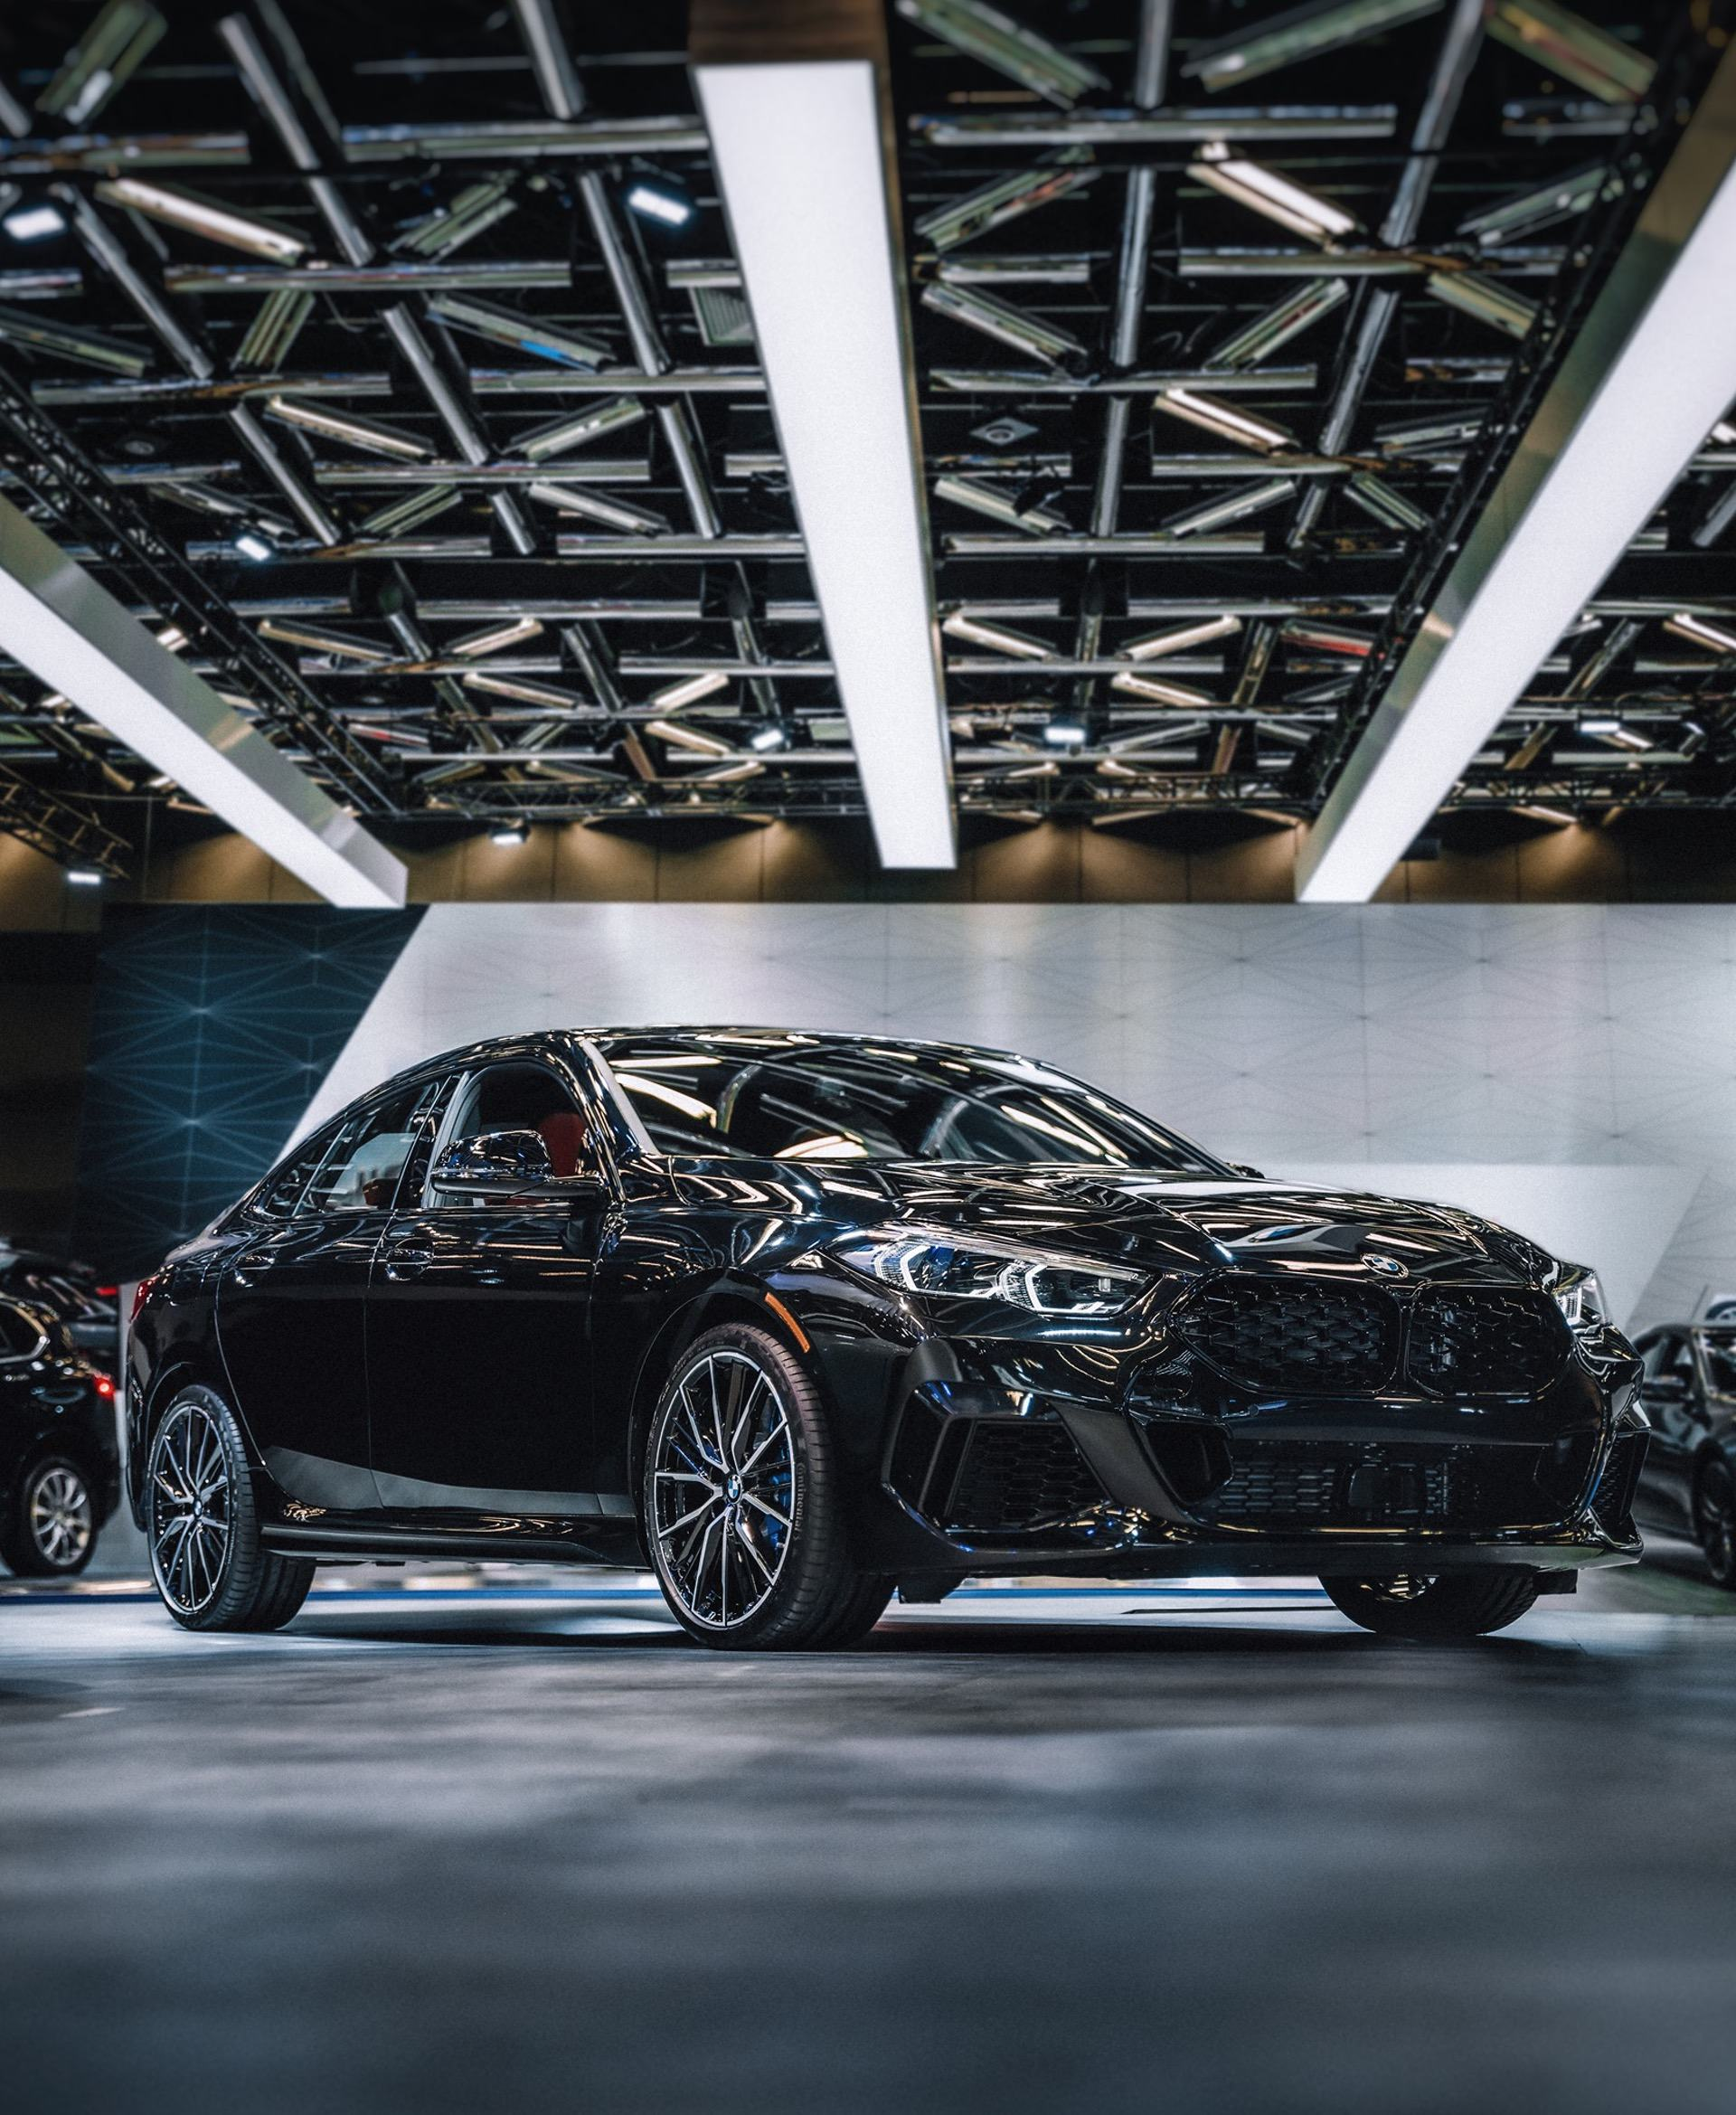 BMW 2 Series Gran Coupe black color 02